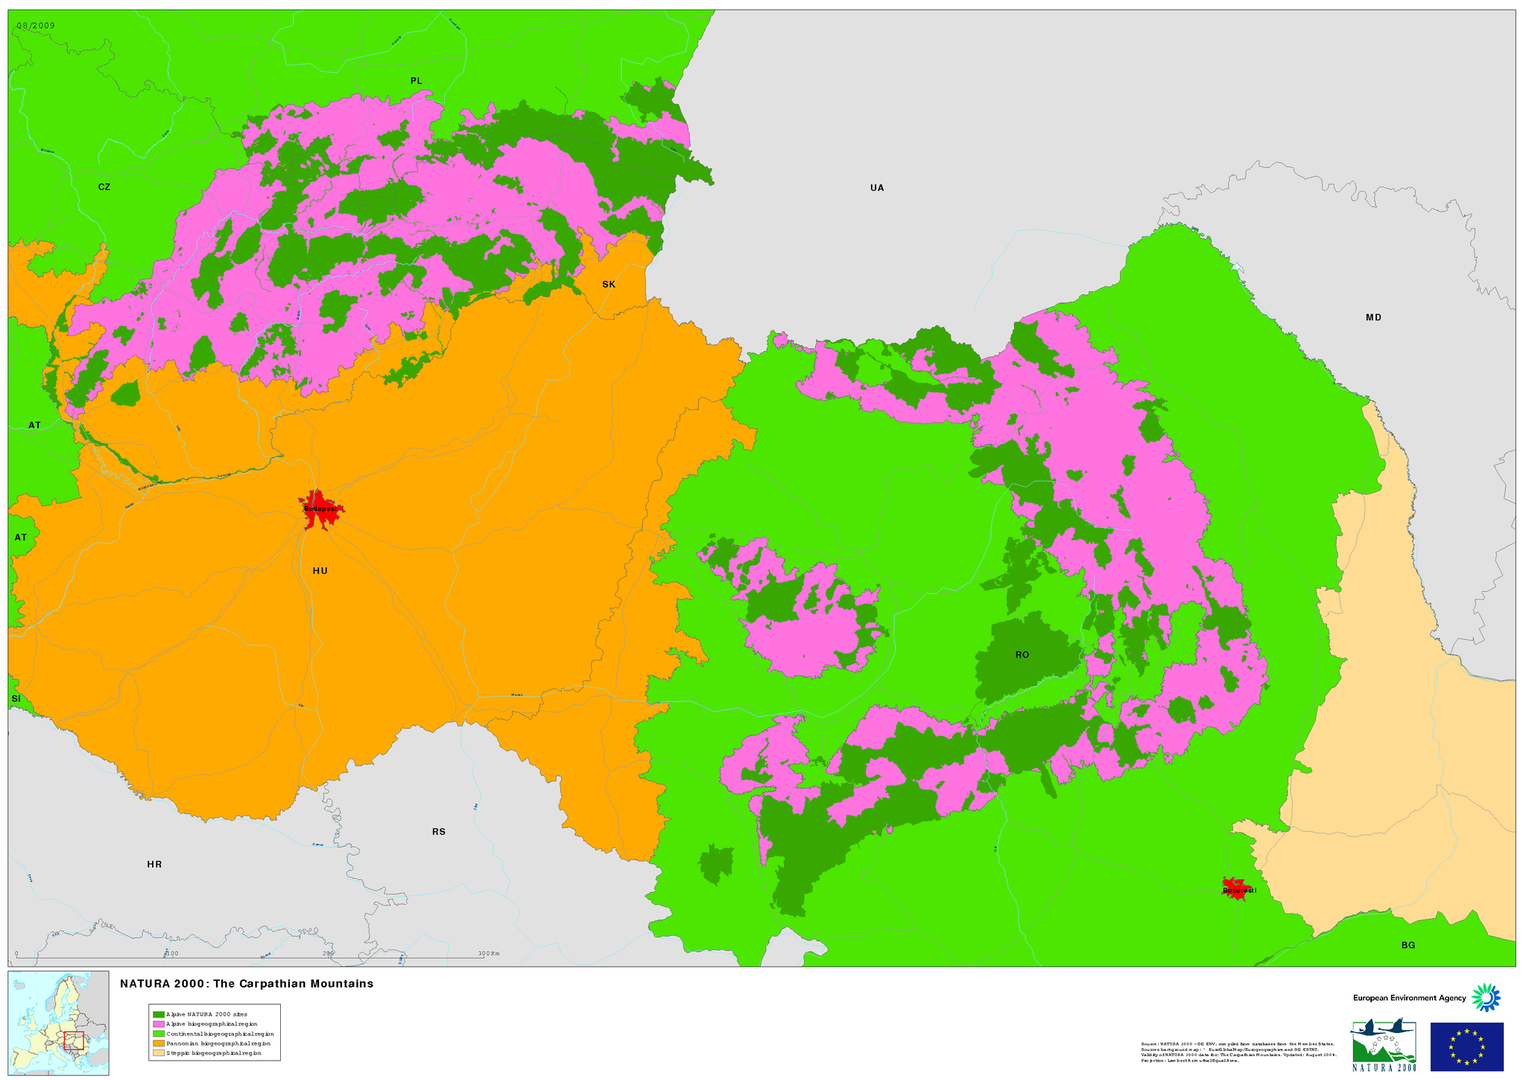 Picture of: Alpine Region The Carpathian Mountains European Environment Agency